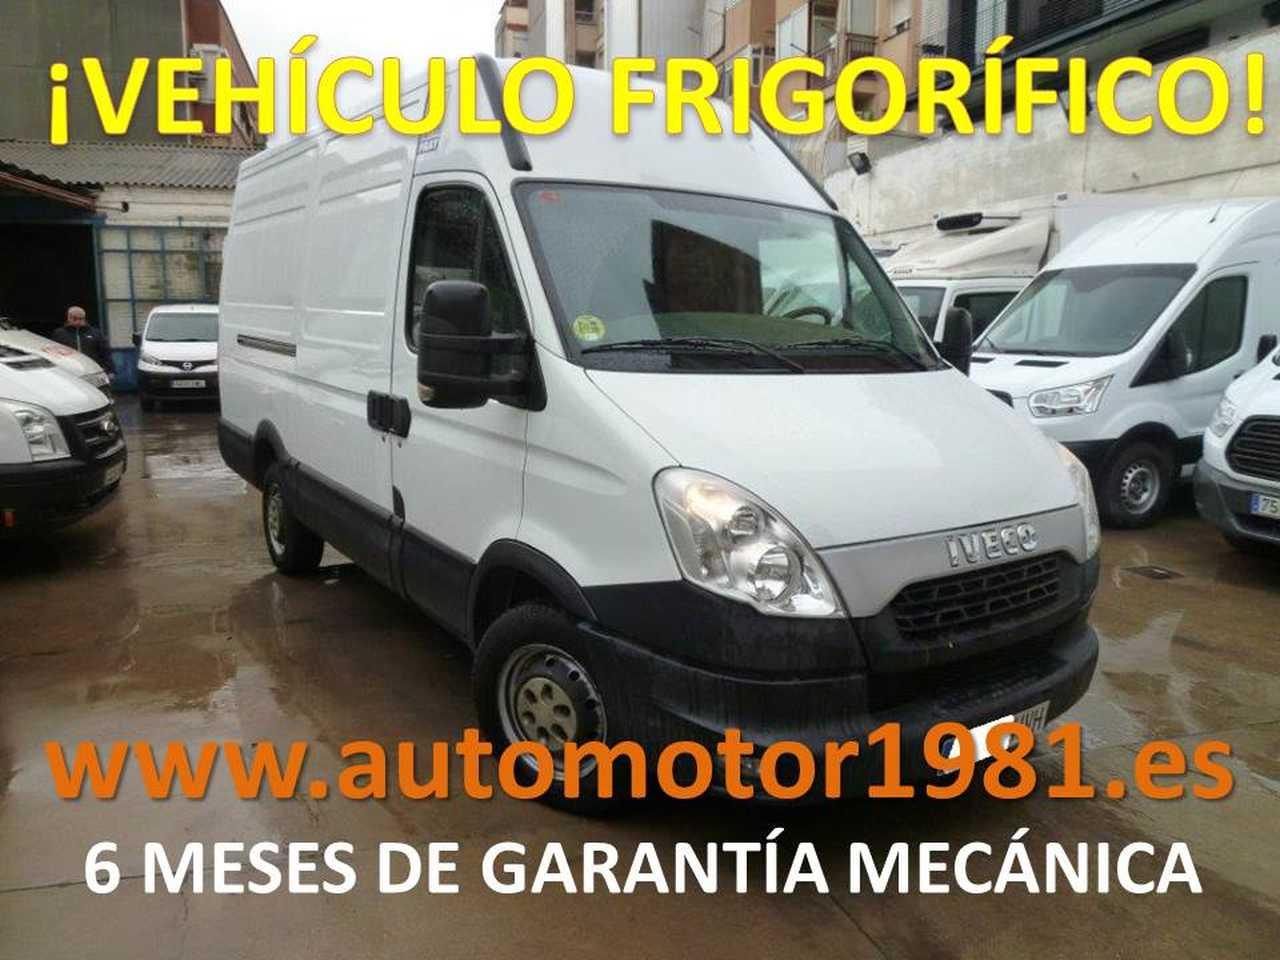 Iveco Daily 35 S 13 L3H2 - 6 MESES GARANTIA MECANICA  - Foto 1